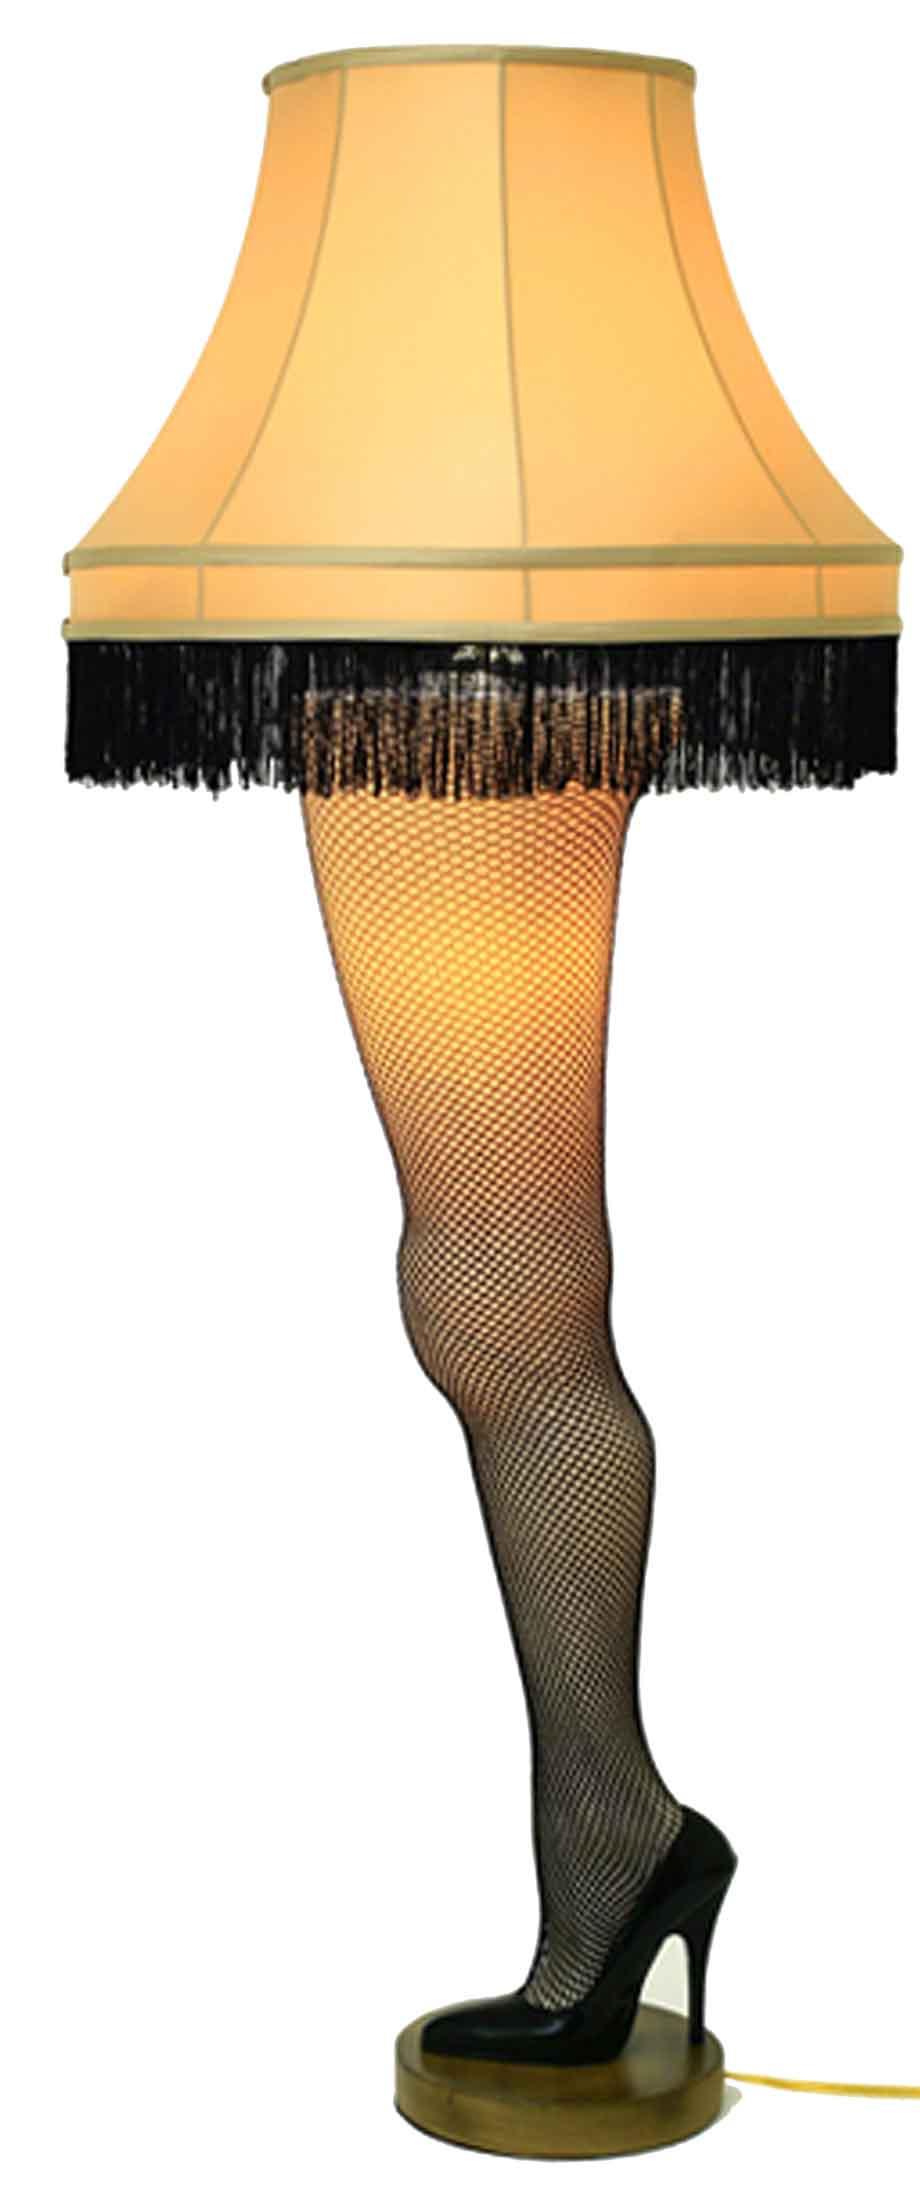 Christmas movie leg lamp.